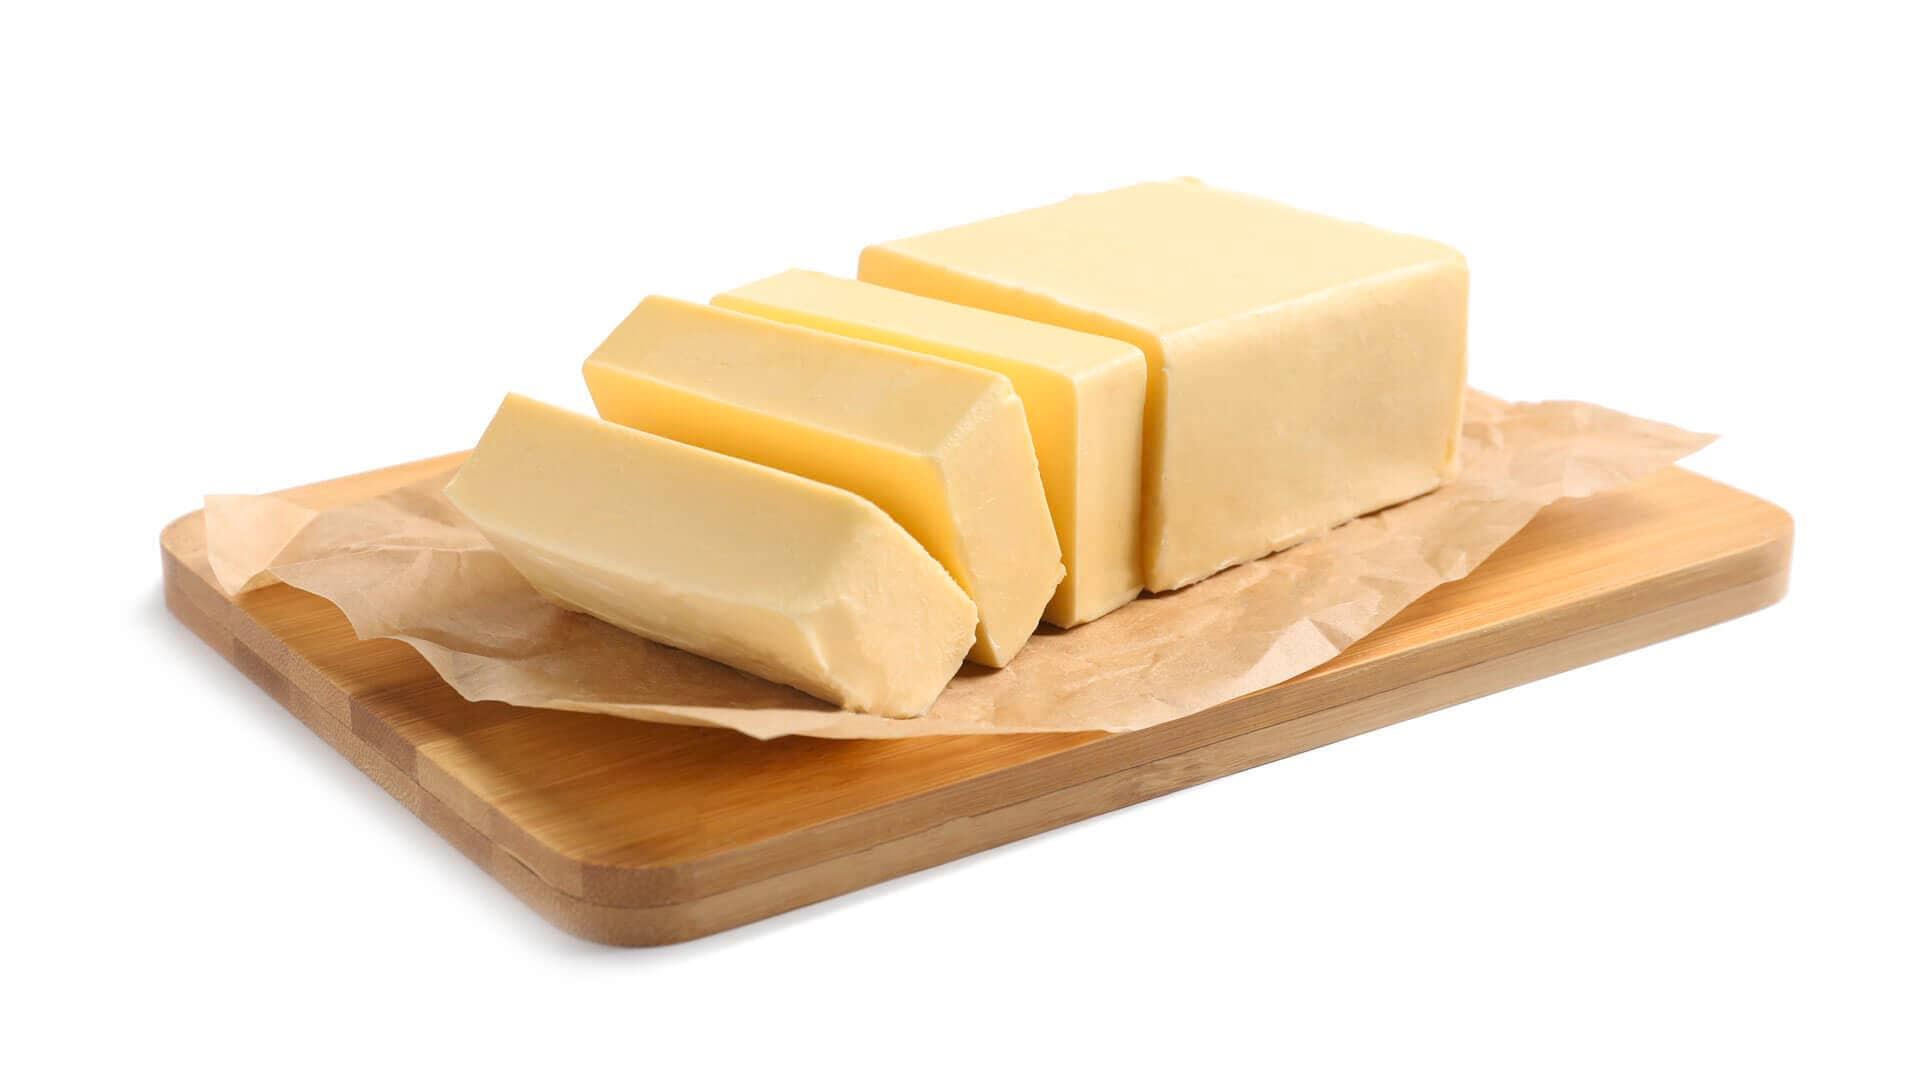 Satu blok mentega dipotong-potong dan diletakkan di atas talenan